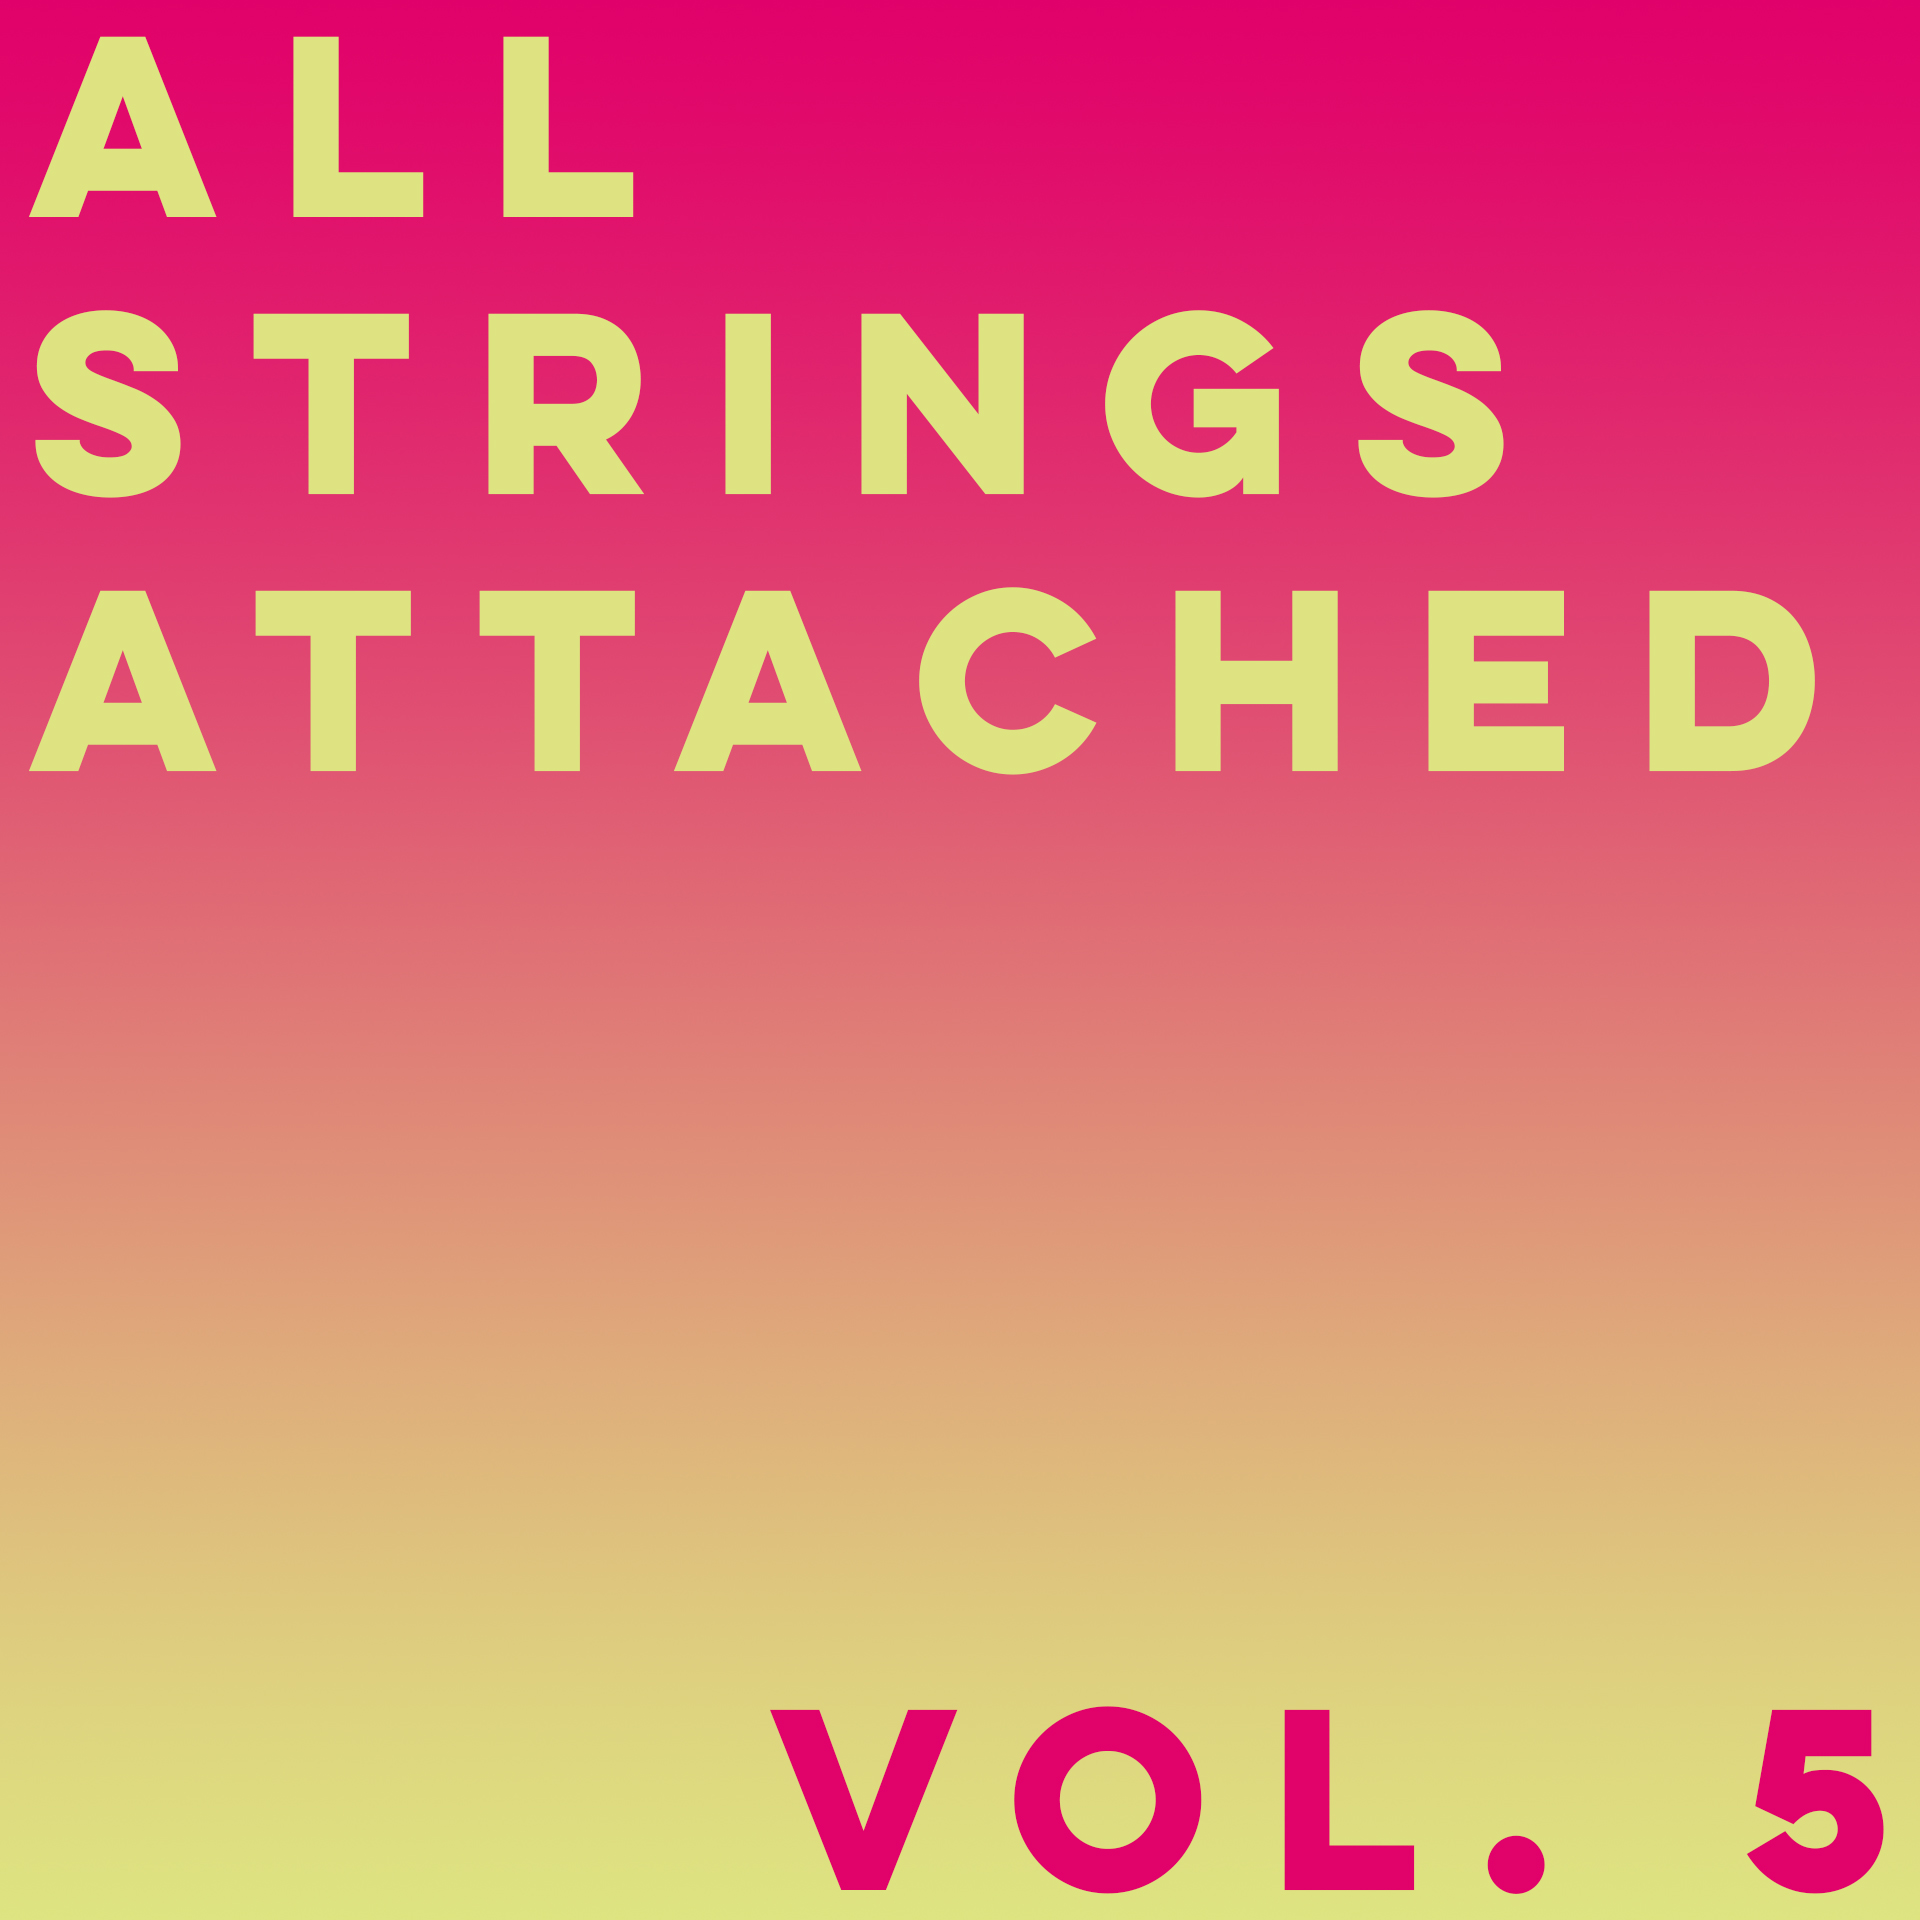 All Strings Attached (Vol. 5) Art.jpg